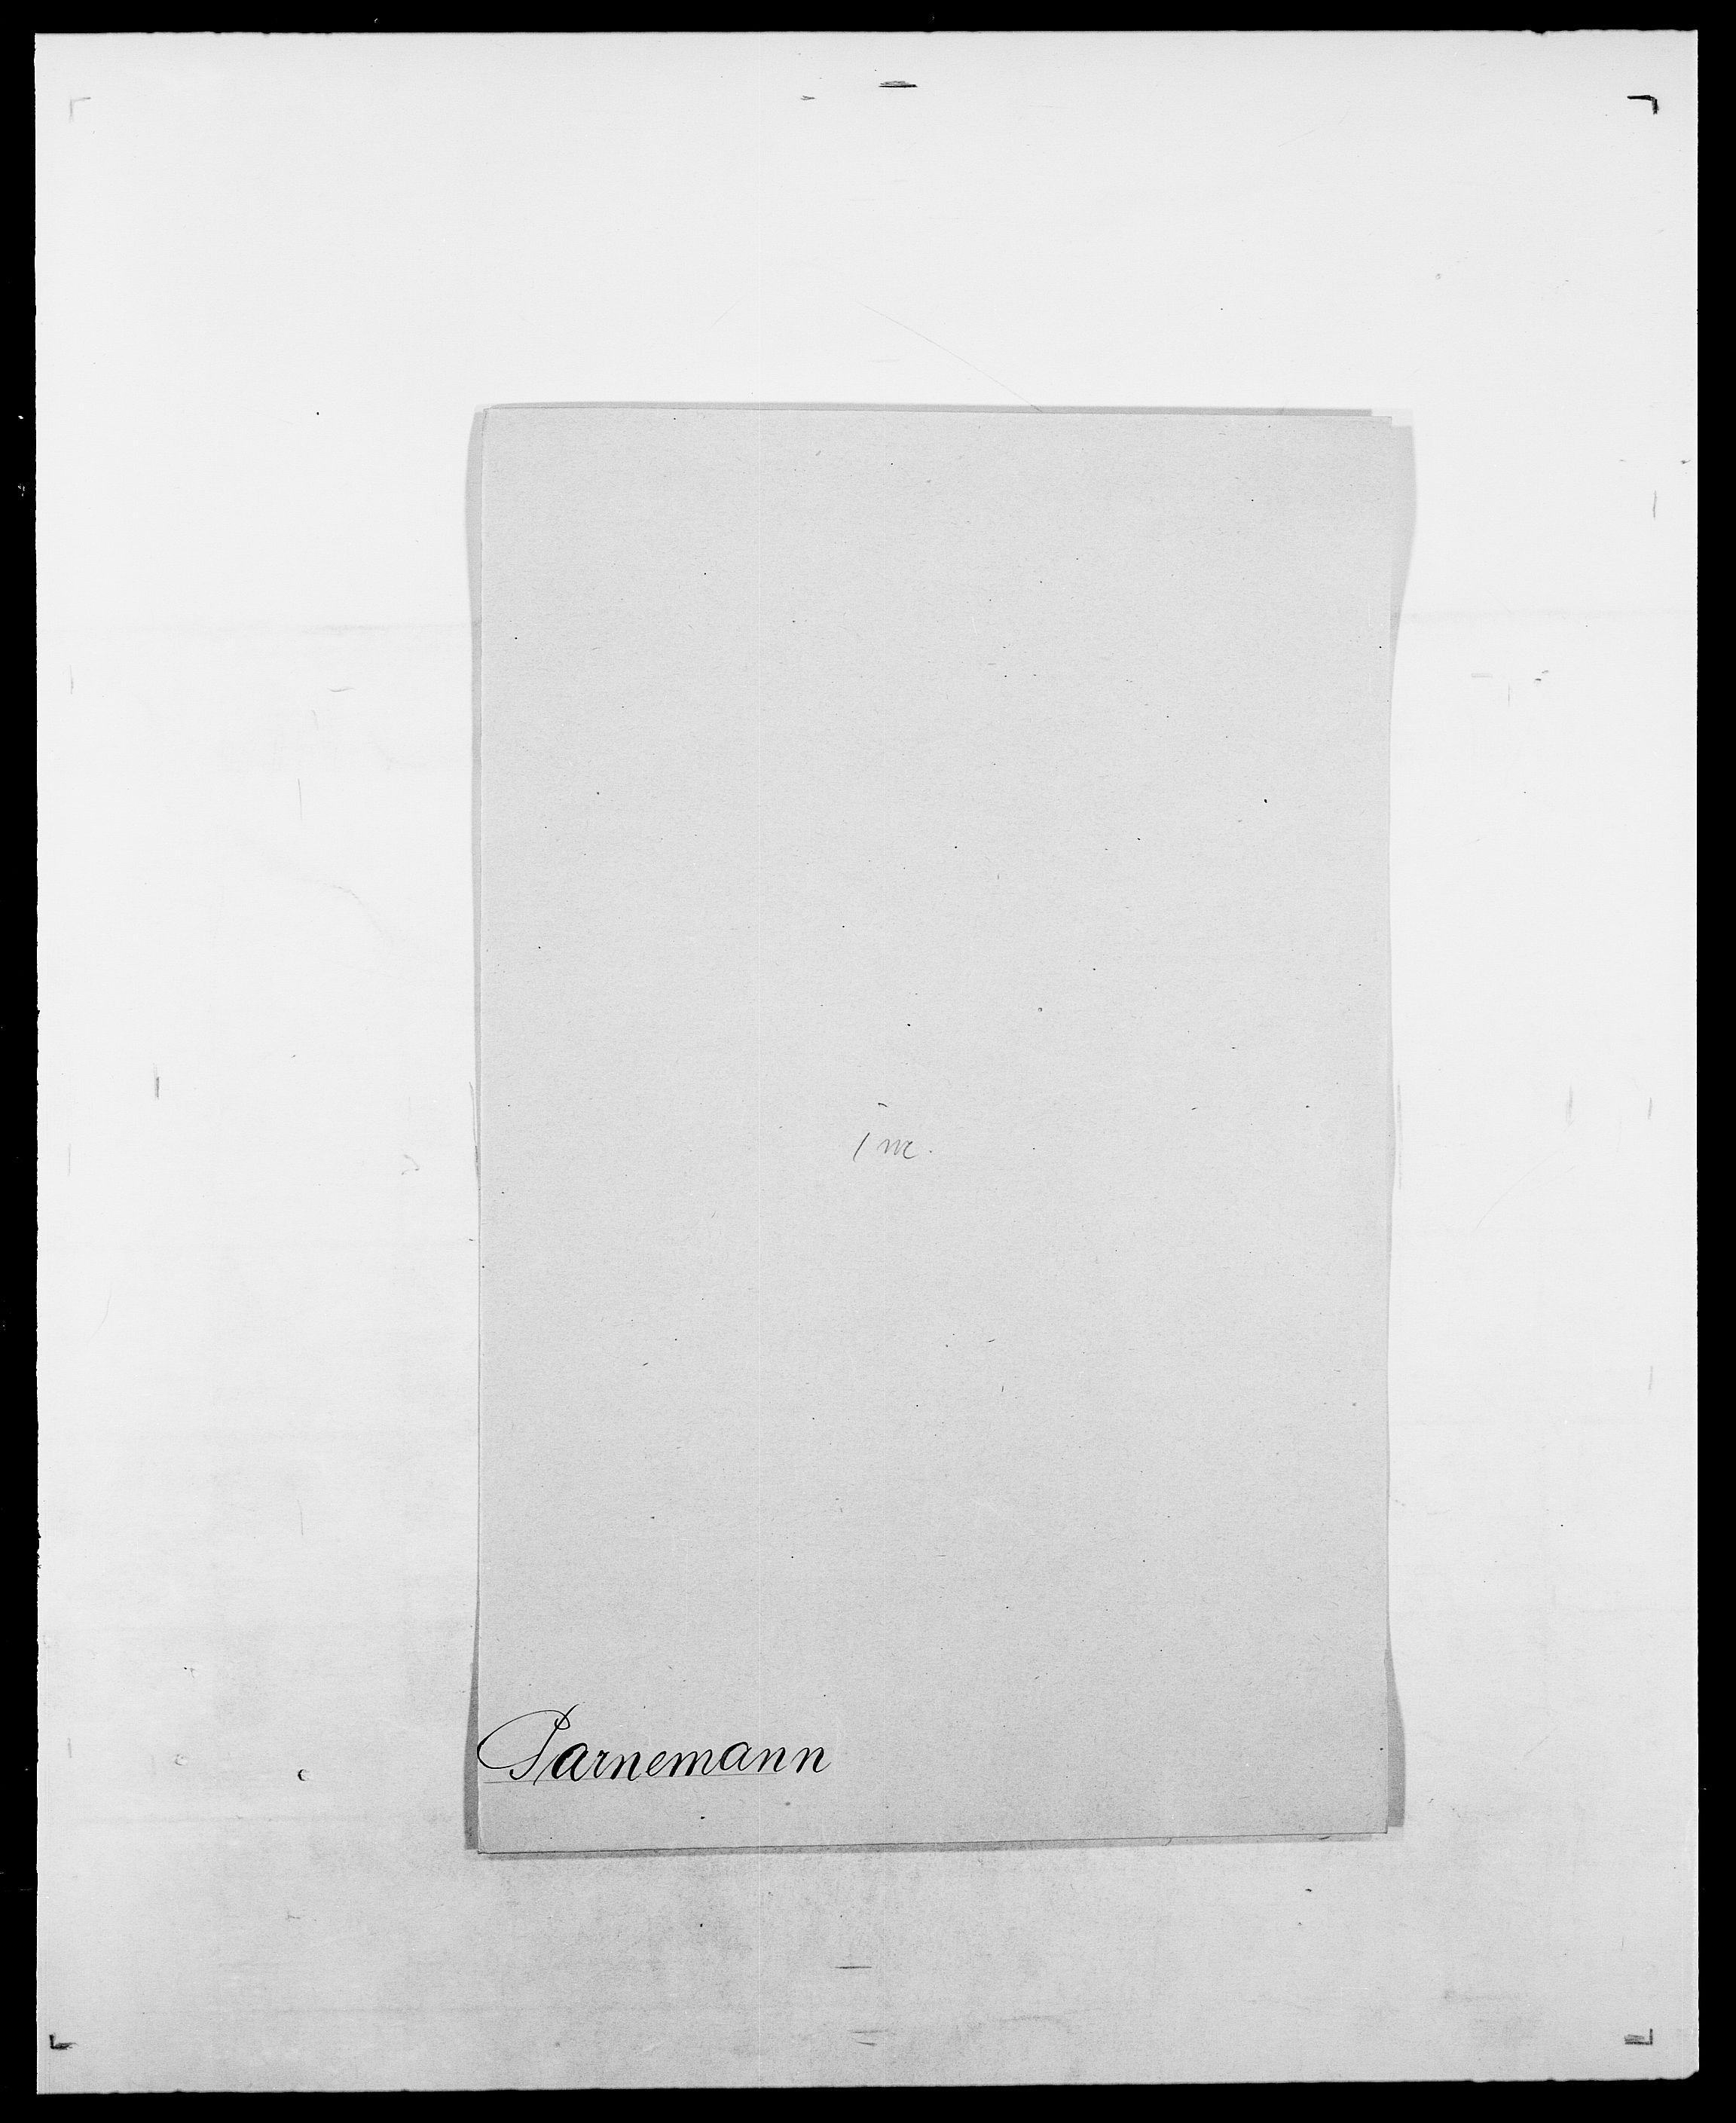 SAO, Delgobe, Charles Antoine - samling, D/Da/L0030: Paars - Pittelkov, s. 121